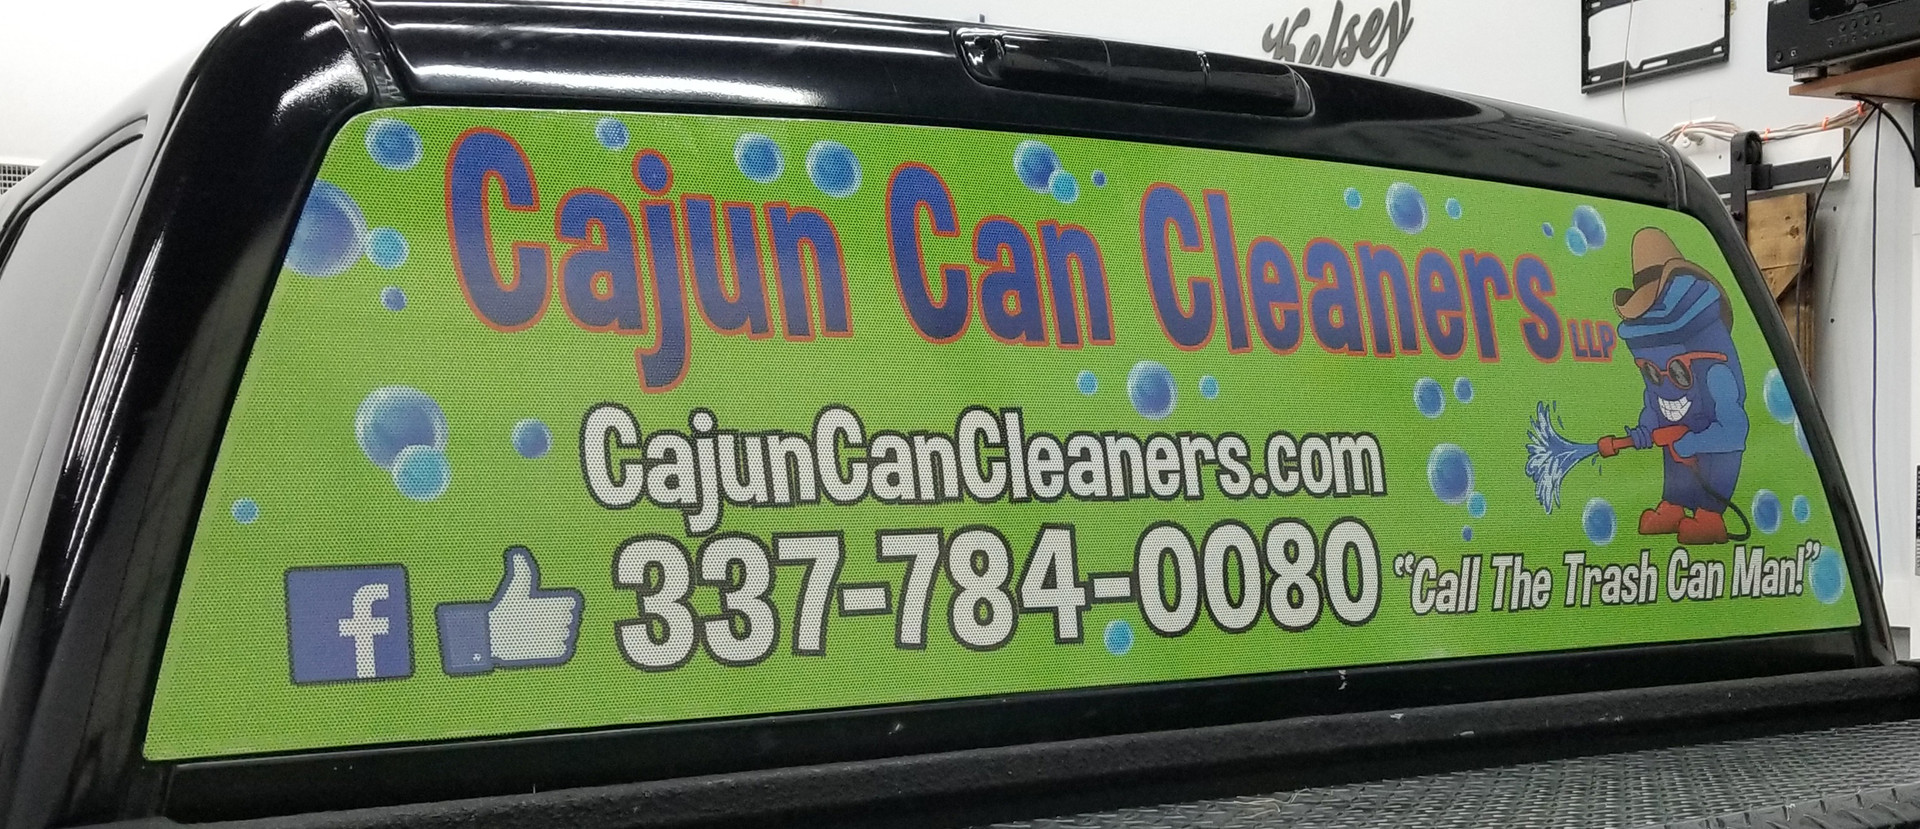 Cajun Can Cleaners-Window Perf.jpg